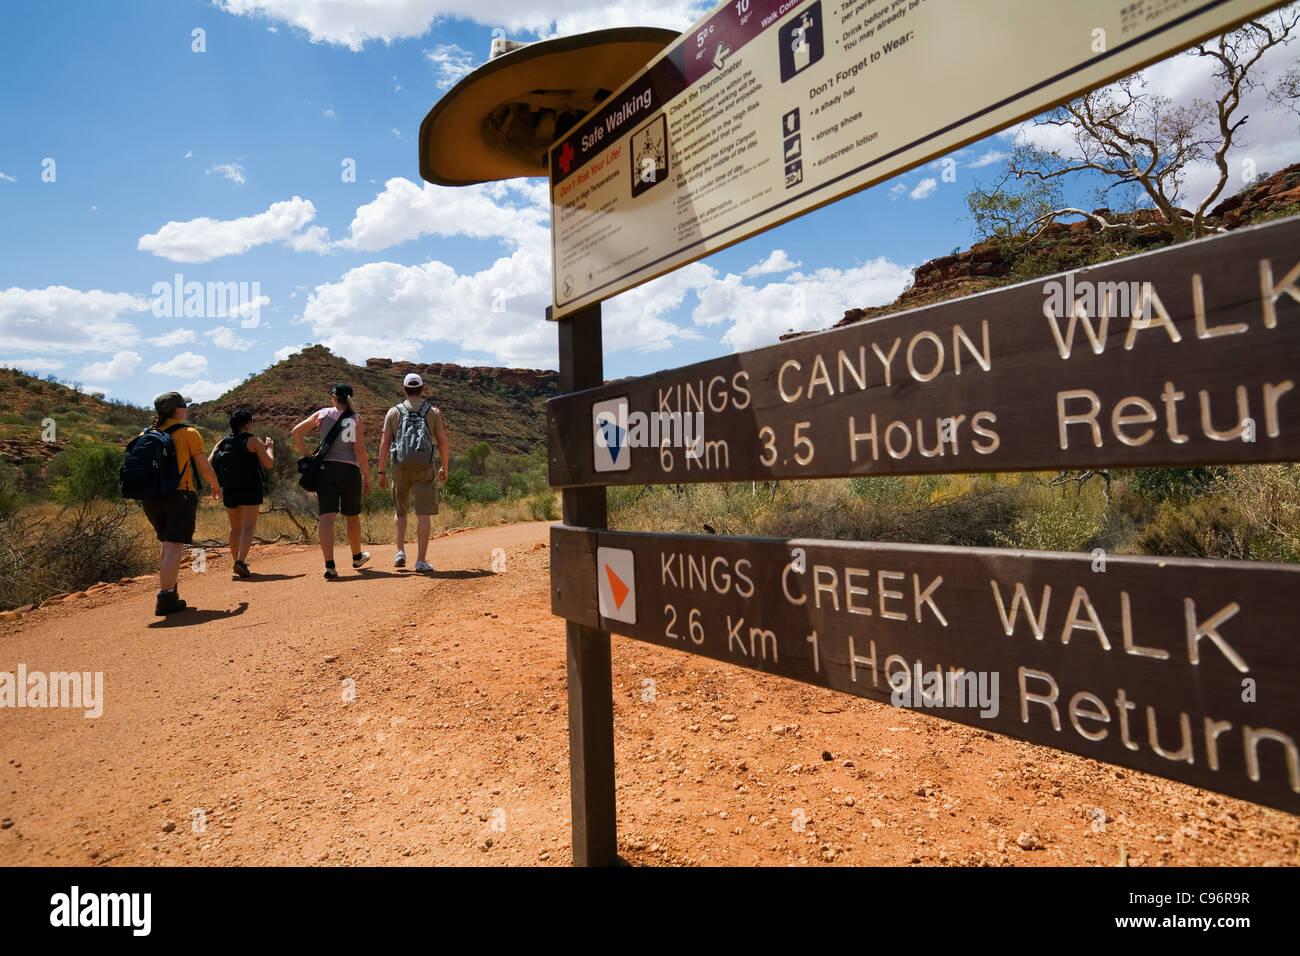 Hikers on the Kings Canyon walk.  Watarrka (Kings Canyon) National Park, Northern Territory, Australia Stock Photo